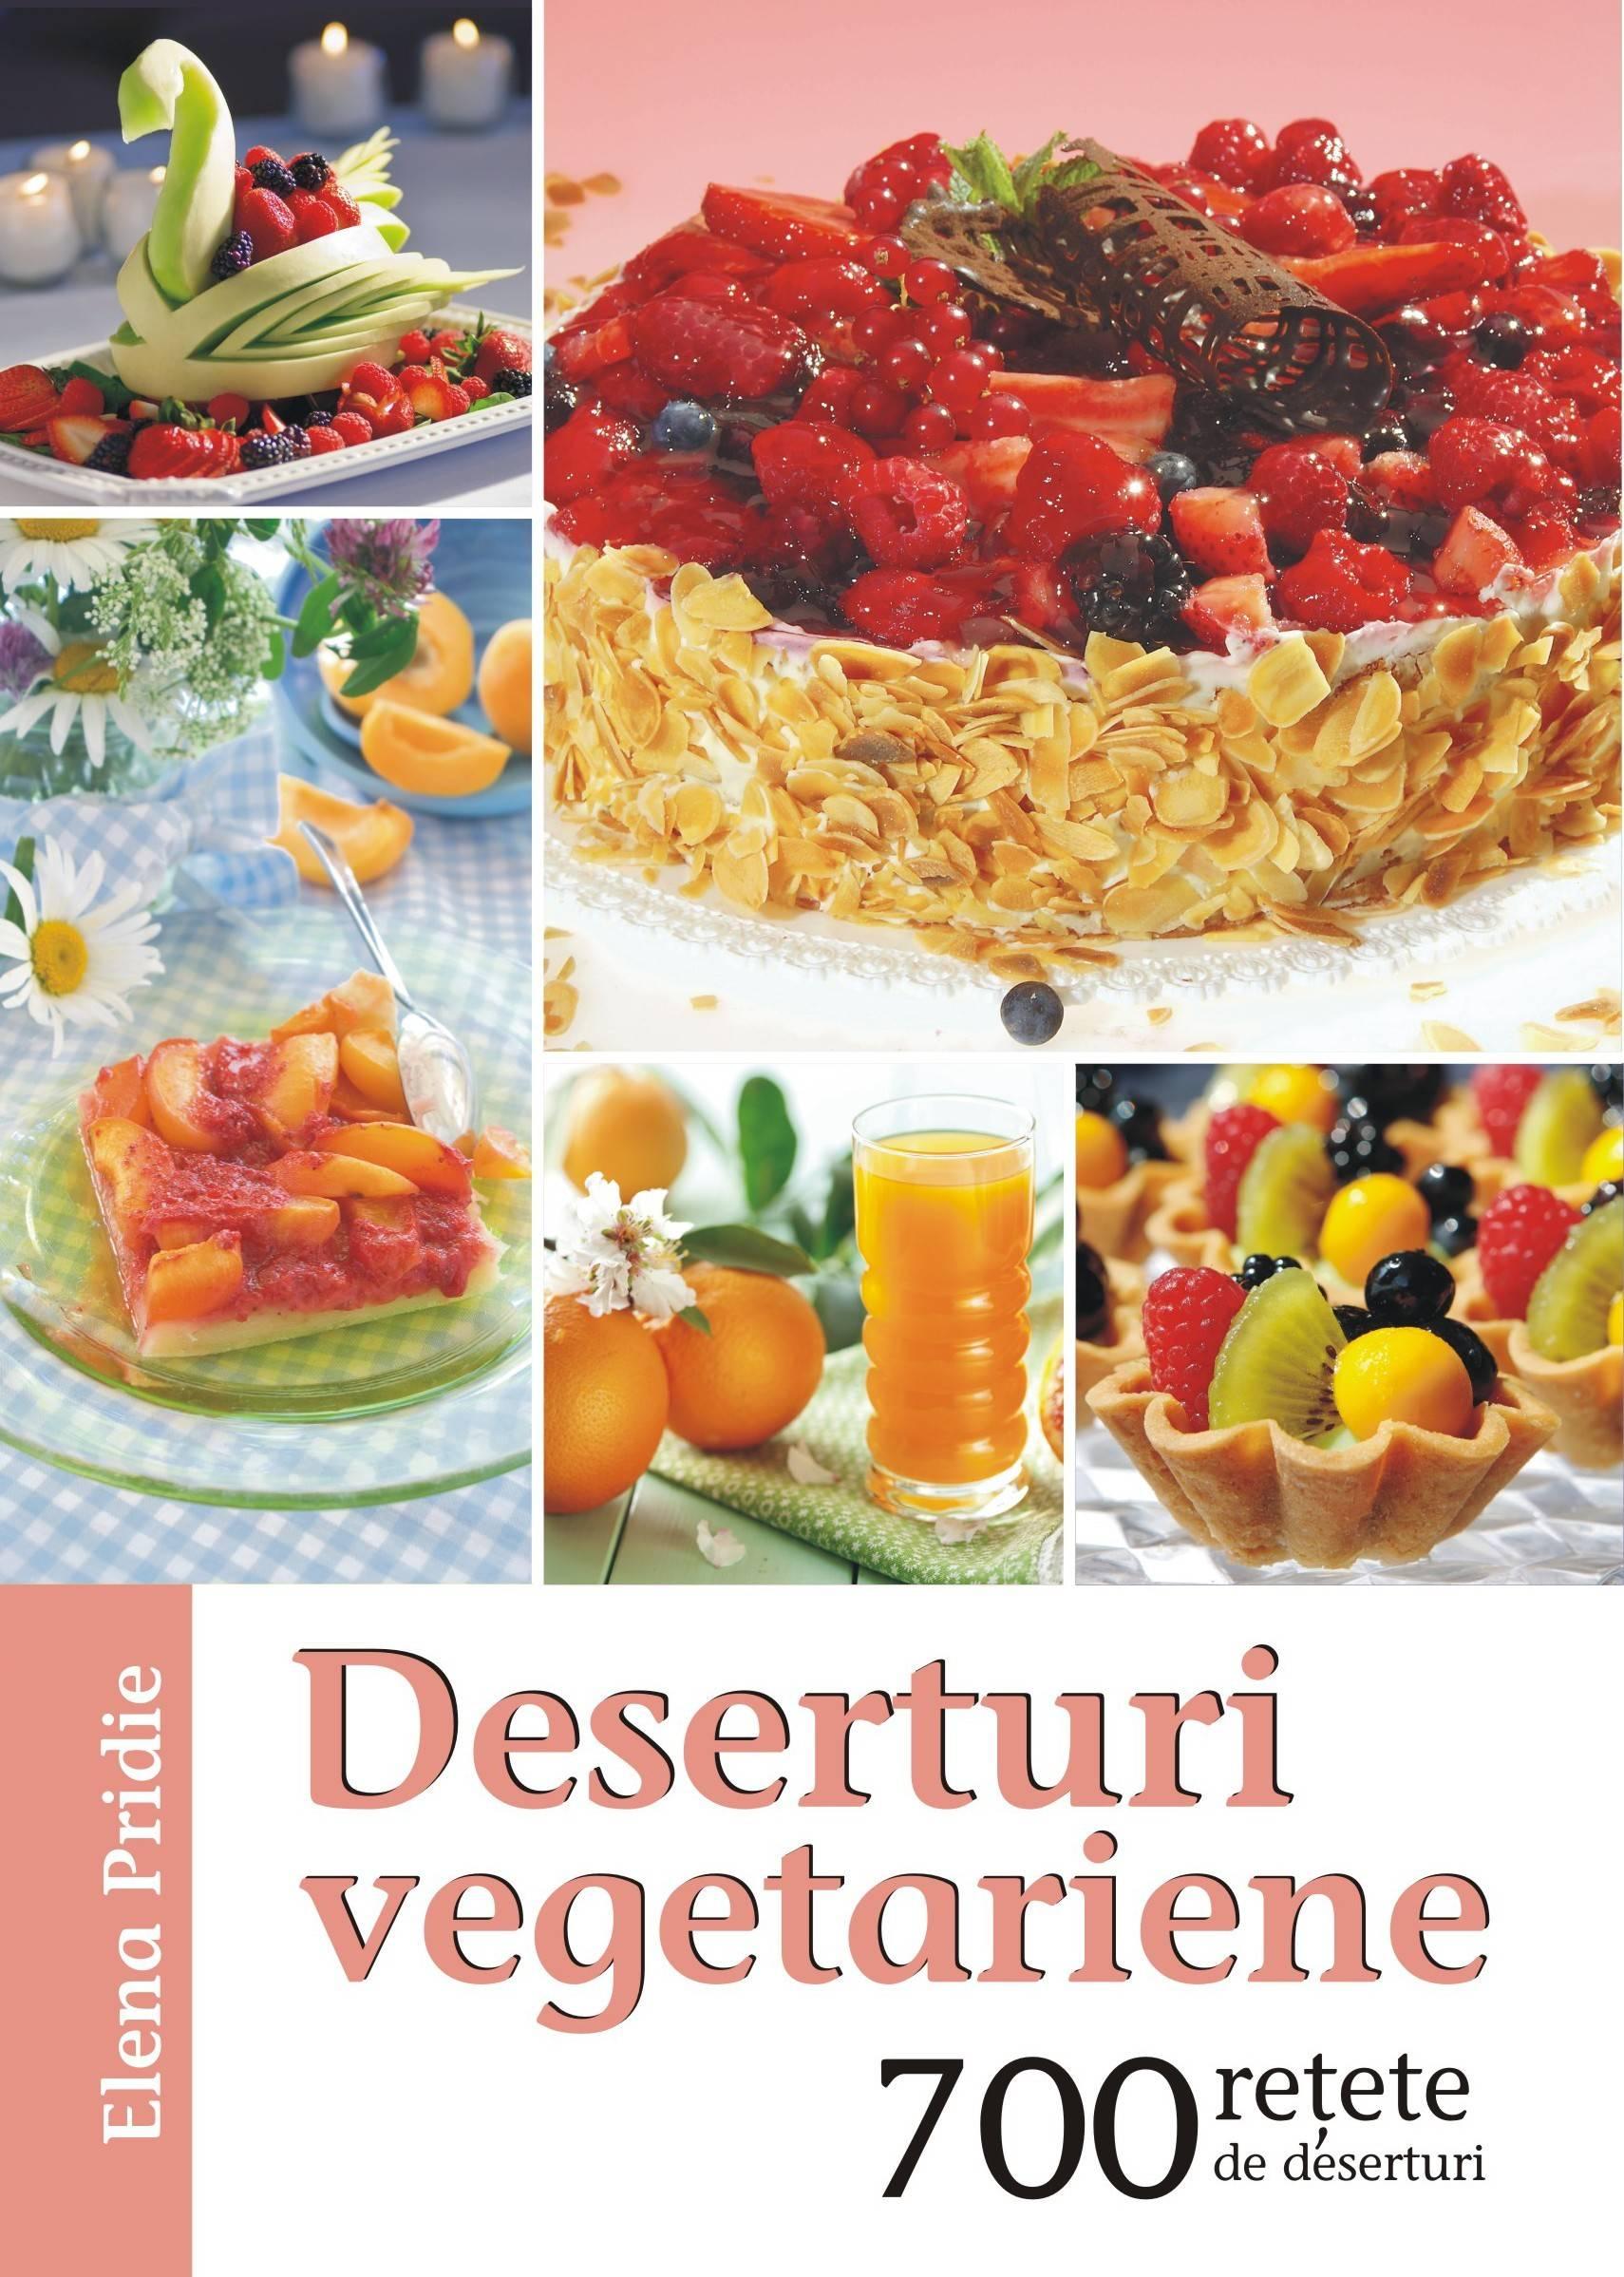 Deserturi vegetariene